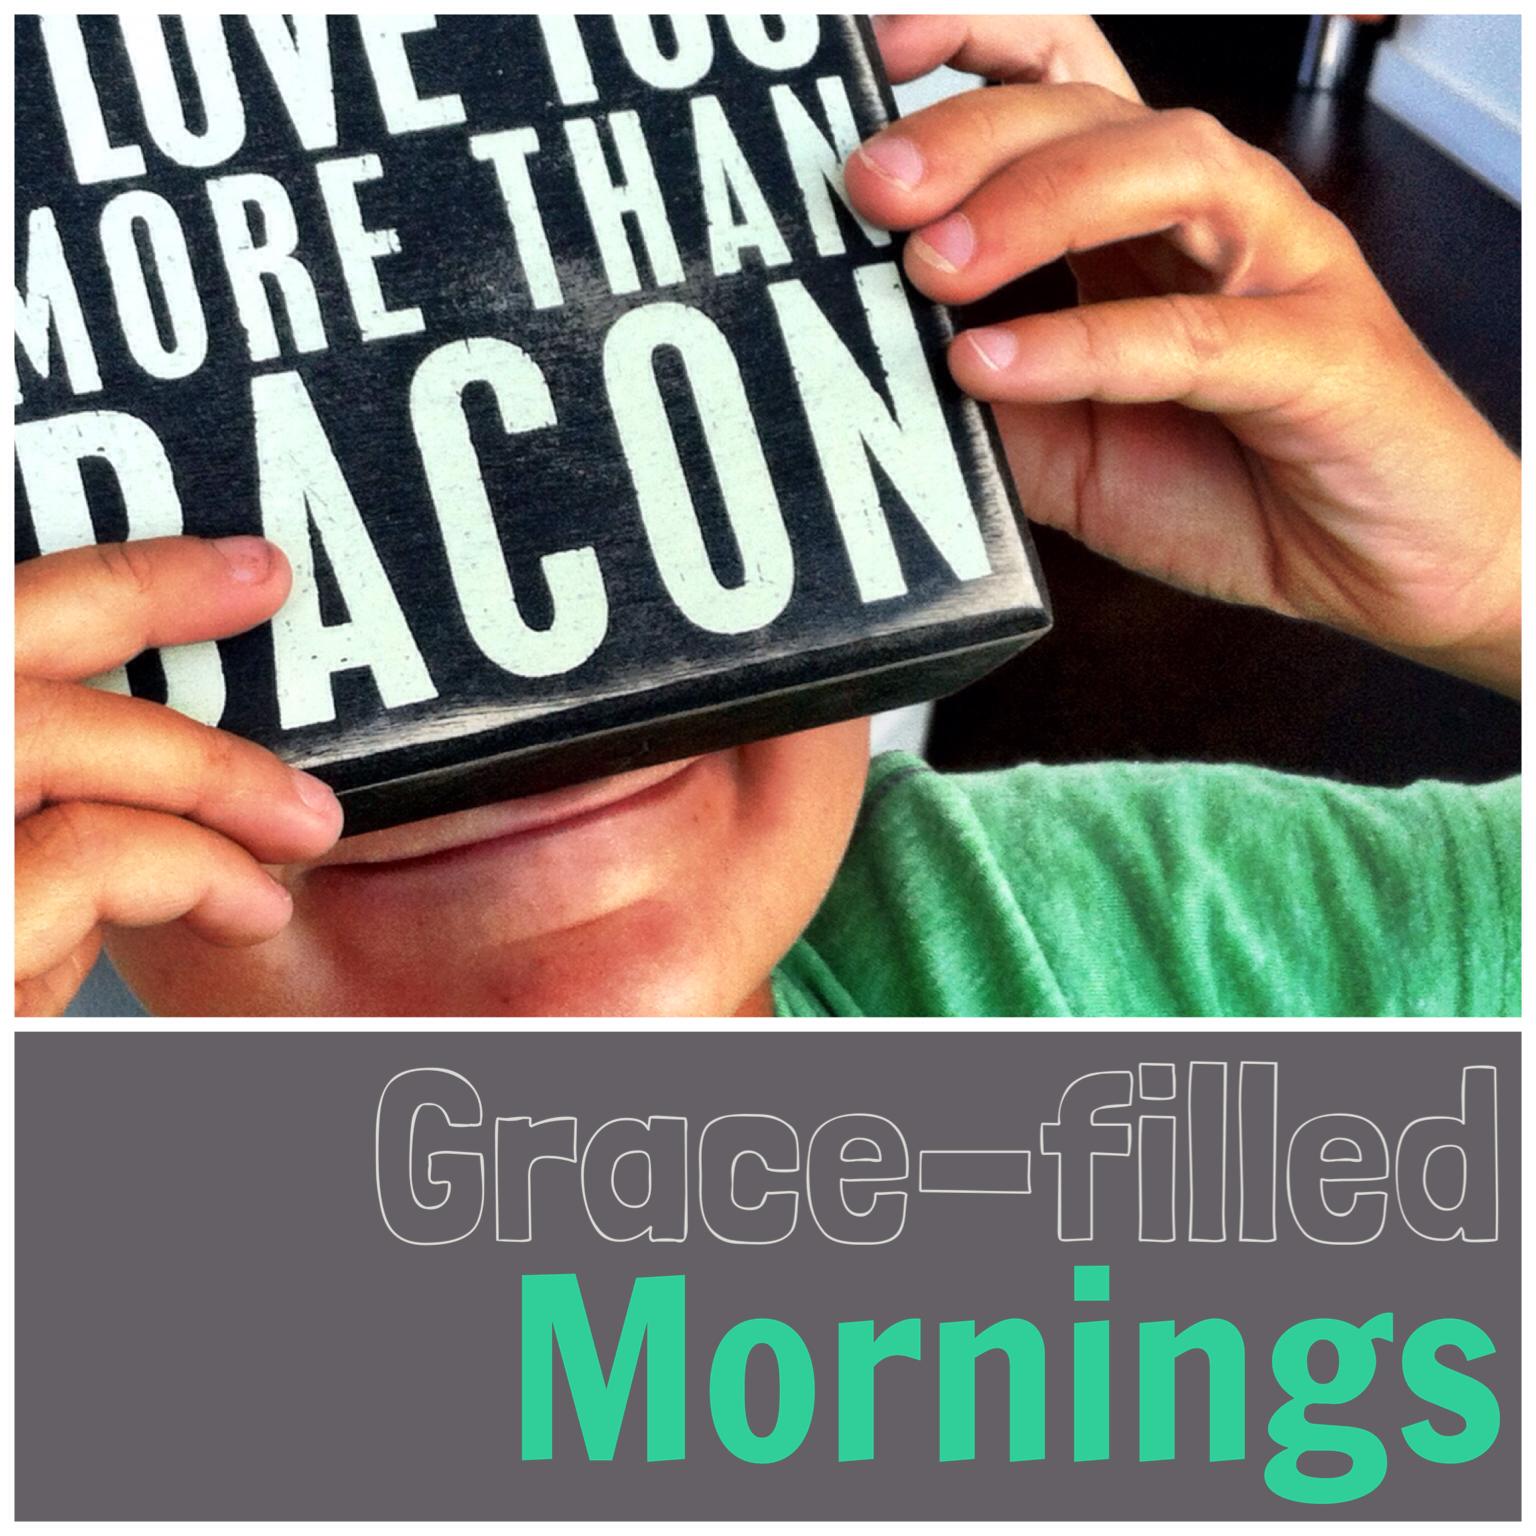 grace-image.jpg